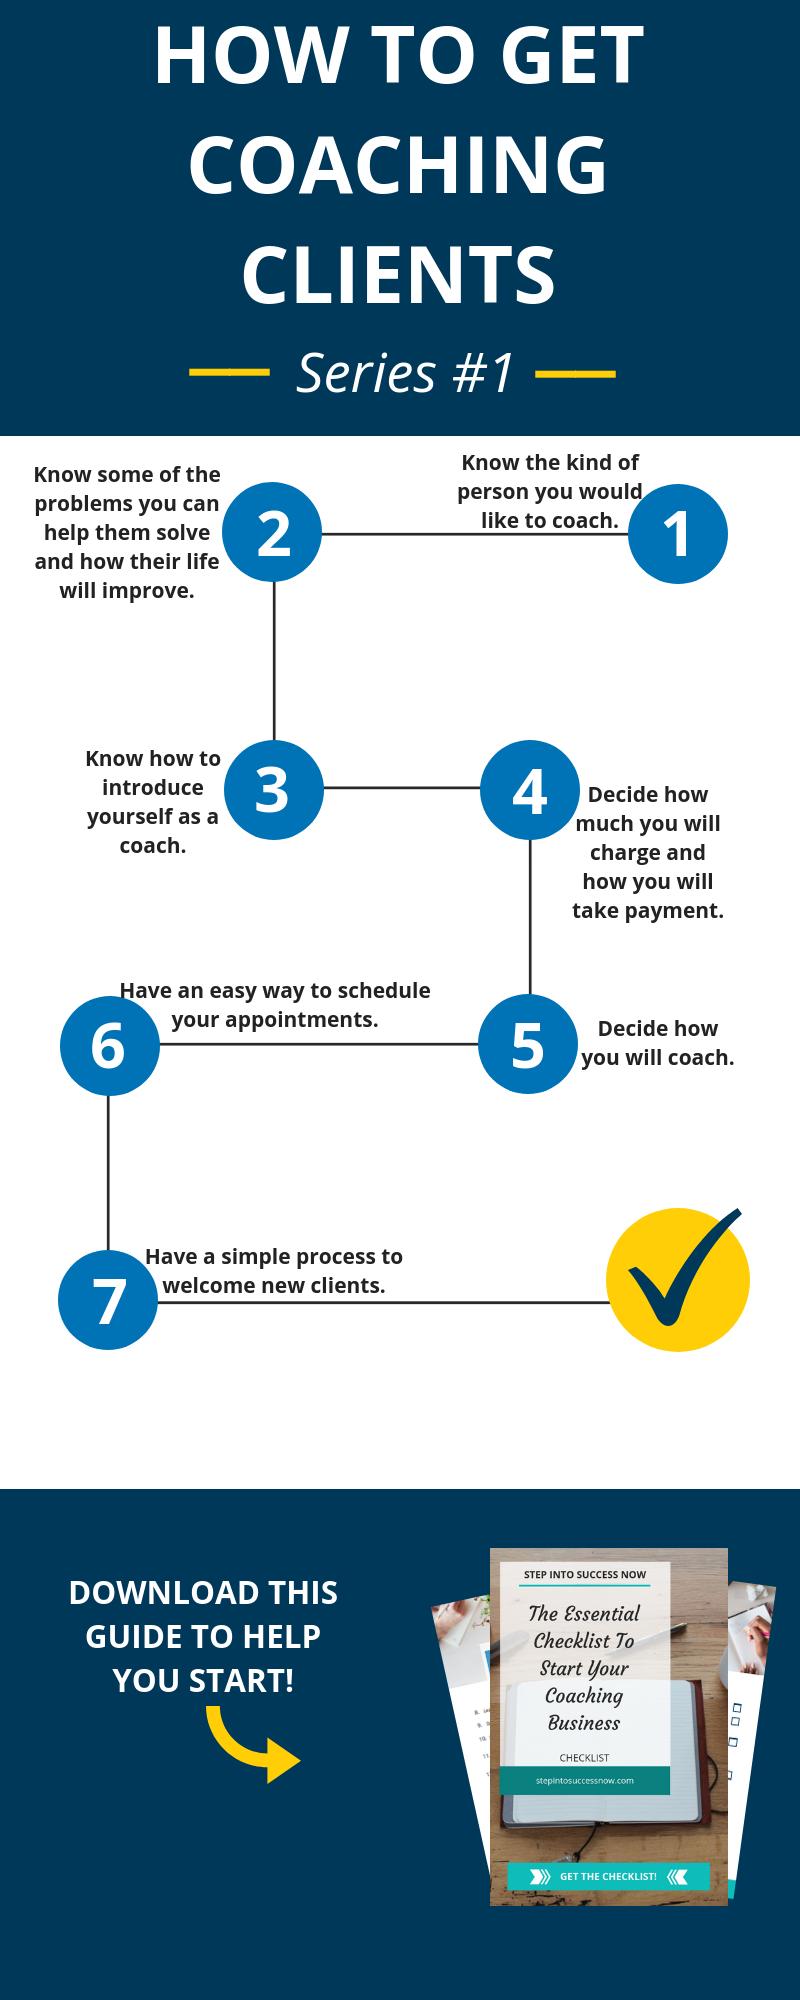 Essential Checklist To Start Your Business